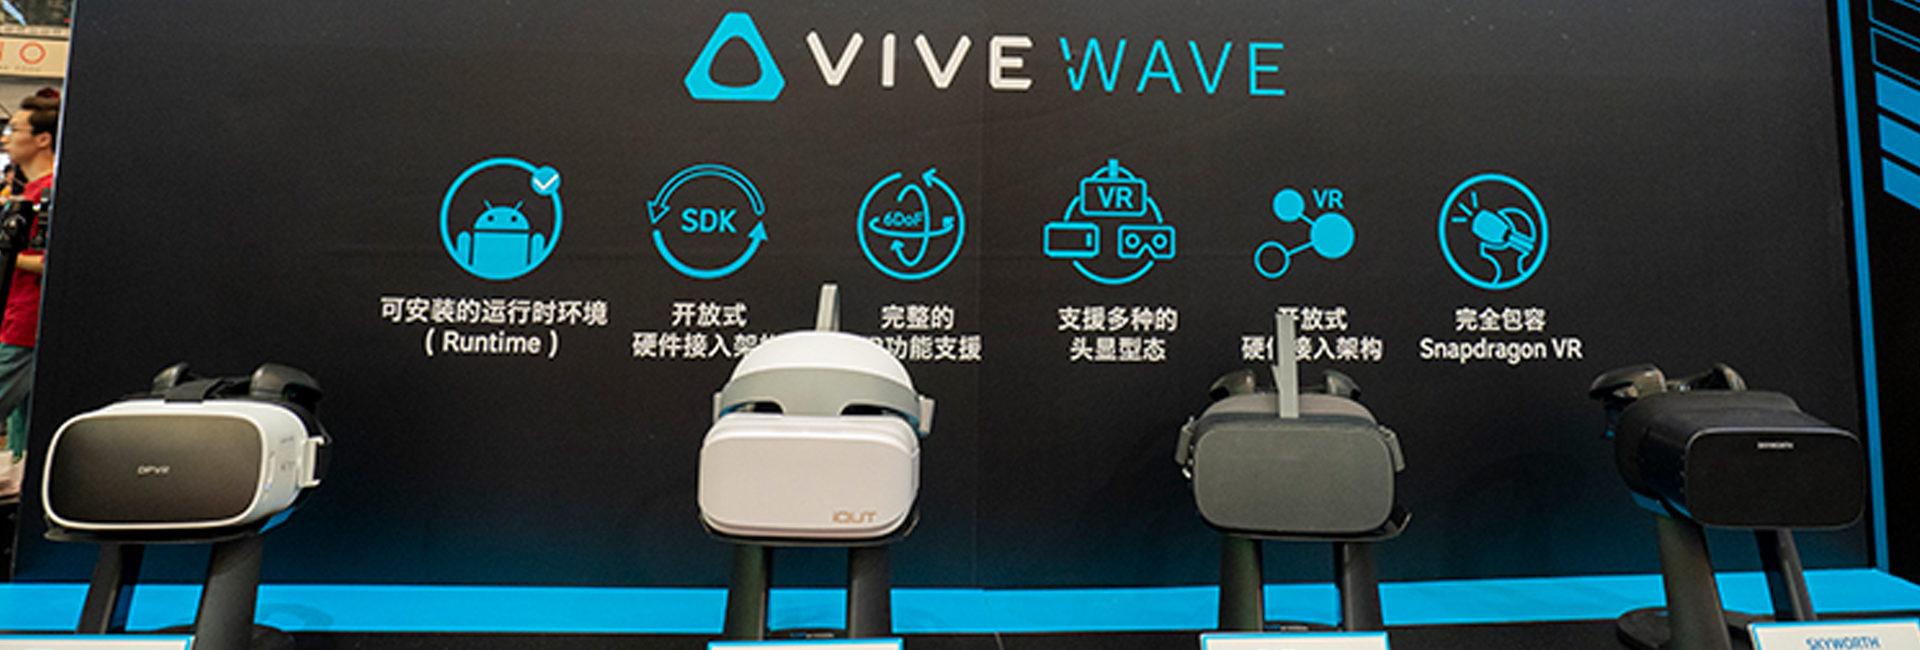 vivpoert-viver-wave